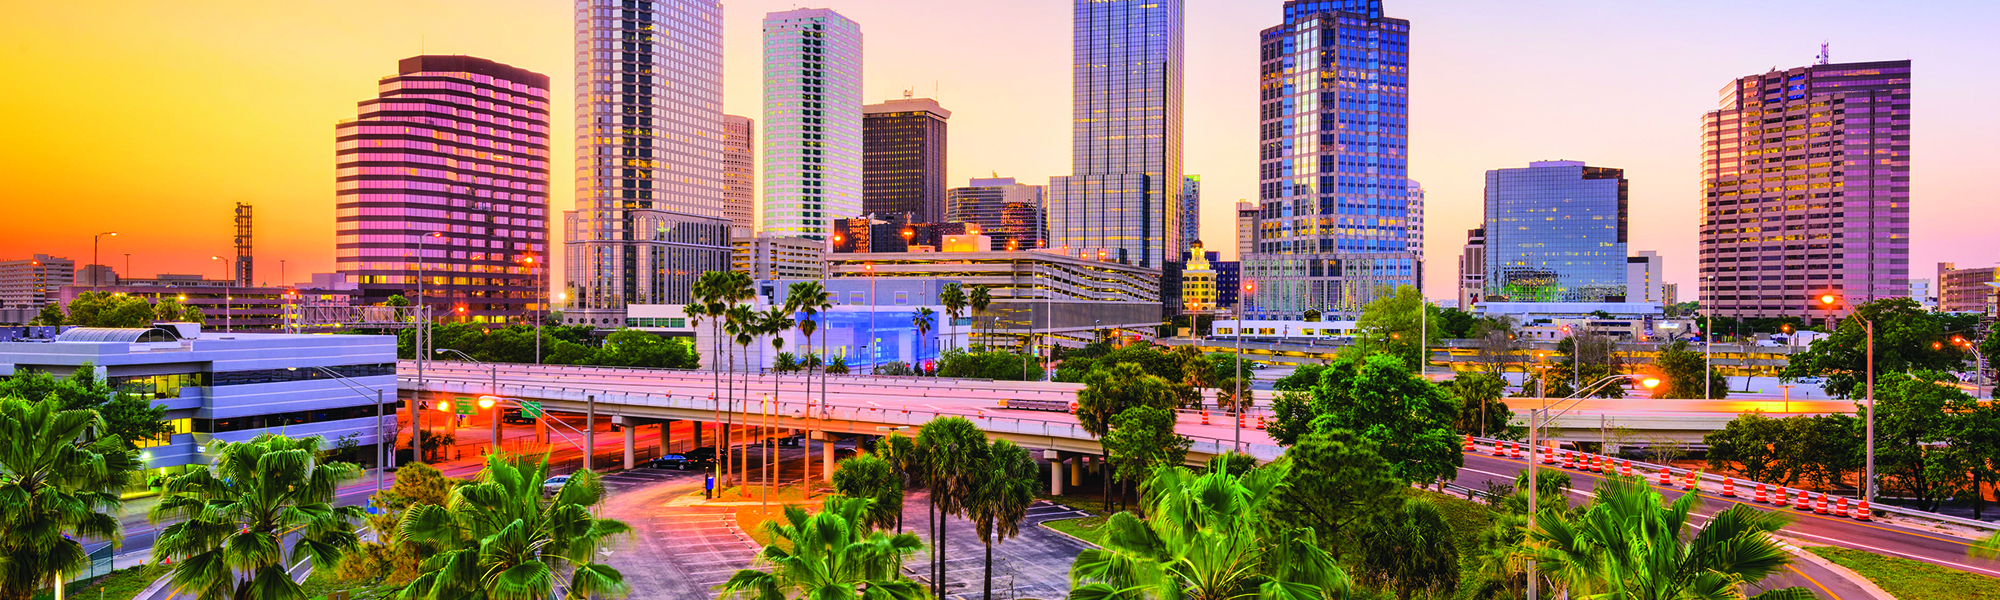 Tampa, FL.jpg